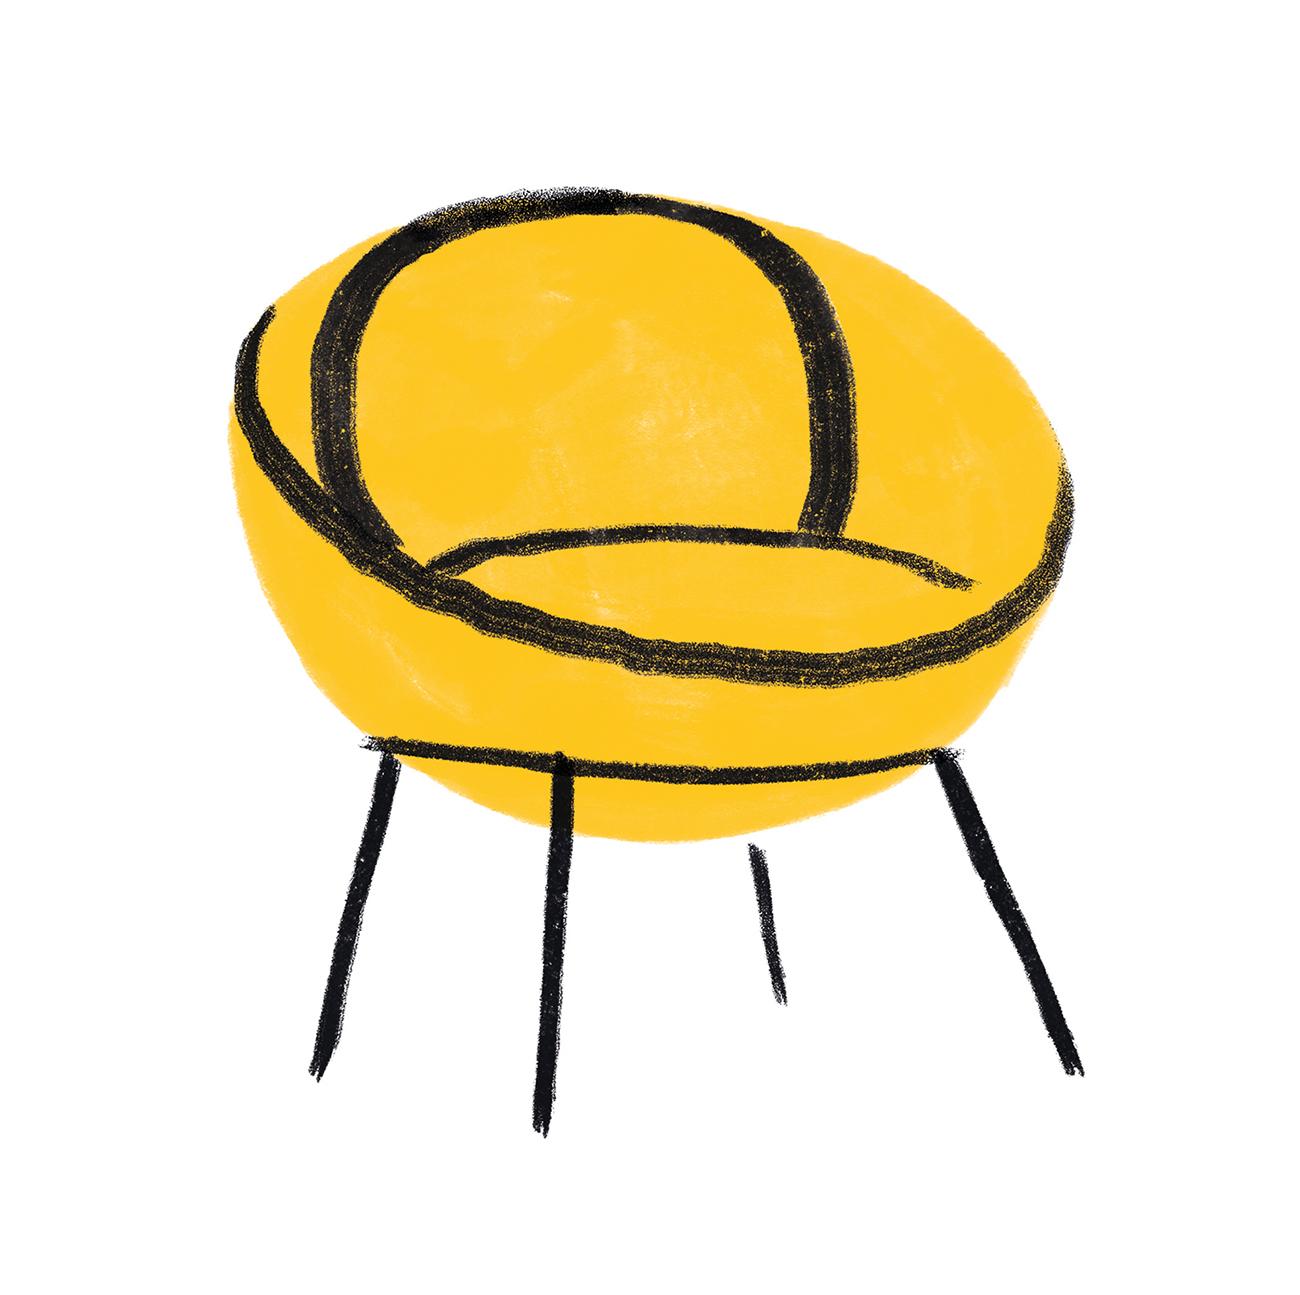 interior-design-women-feminist-chair-obect-Lina-Bo-Bardi-chair-illustration-violeta-noy